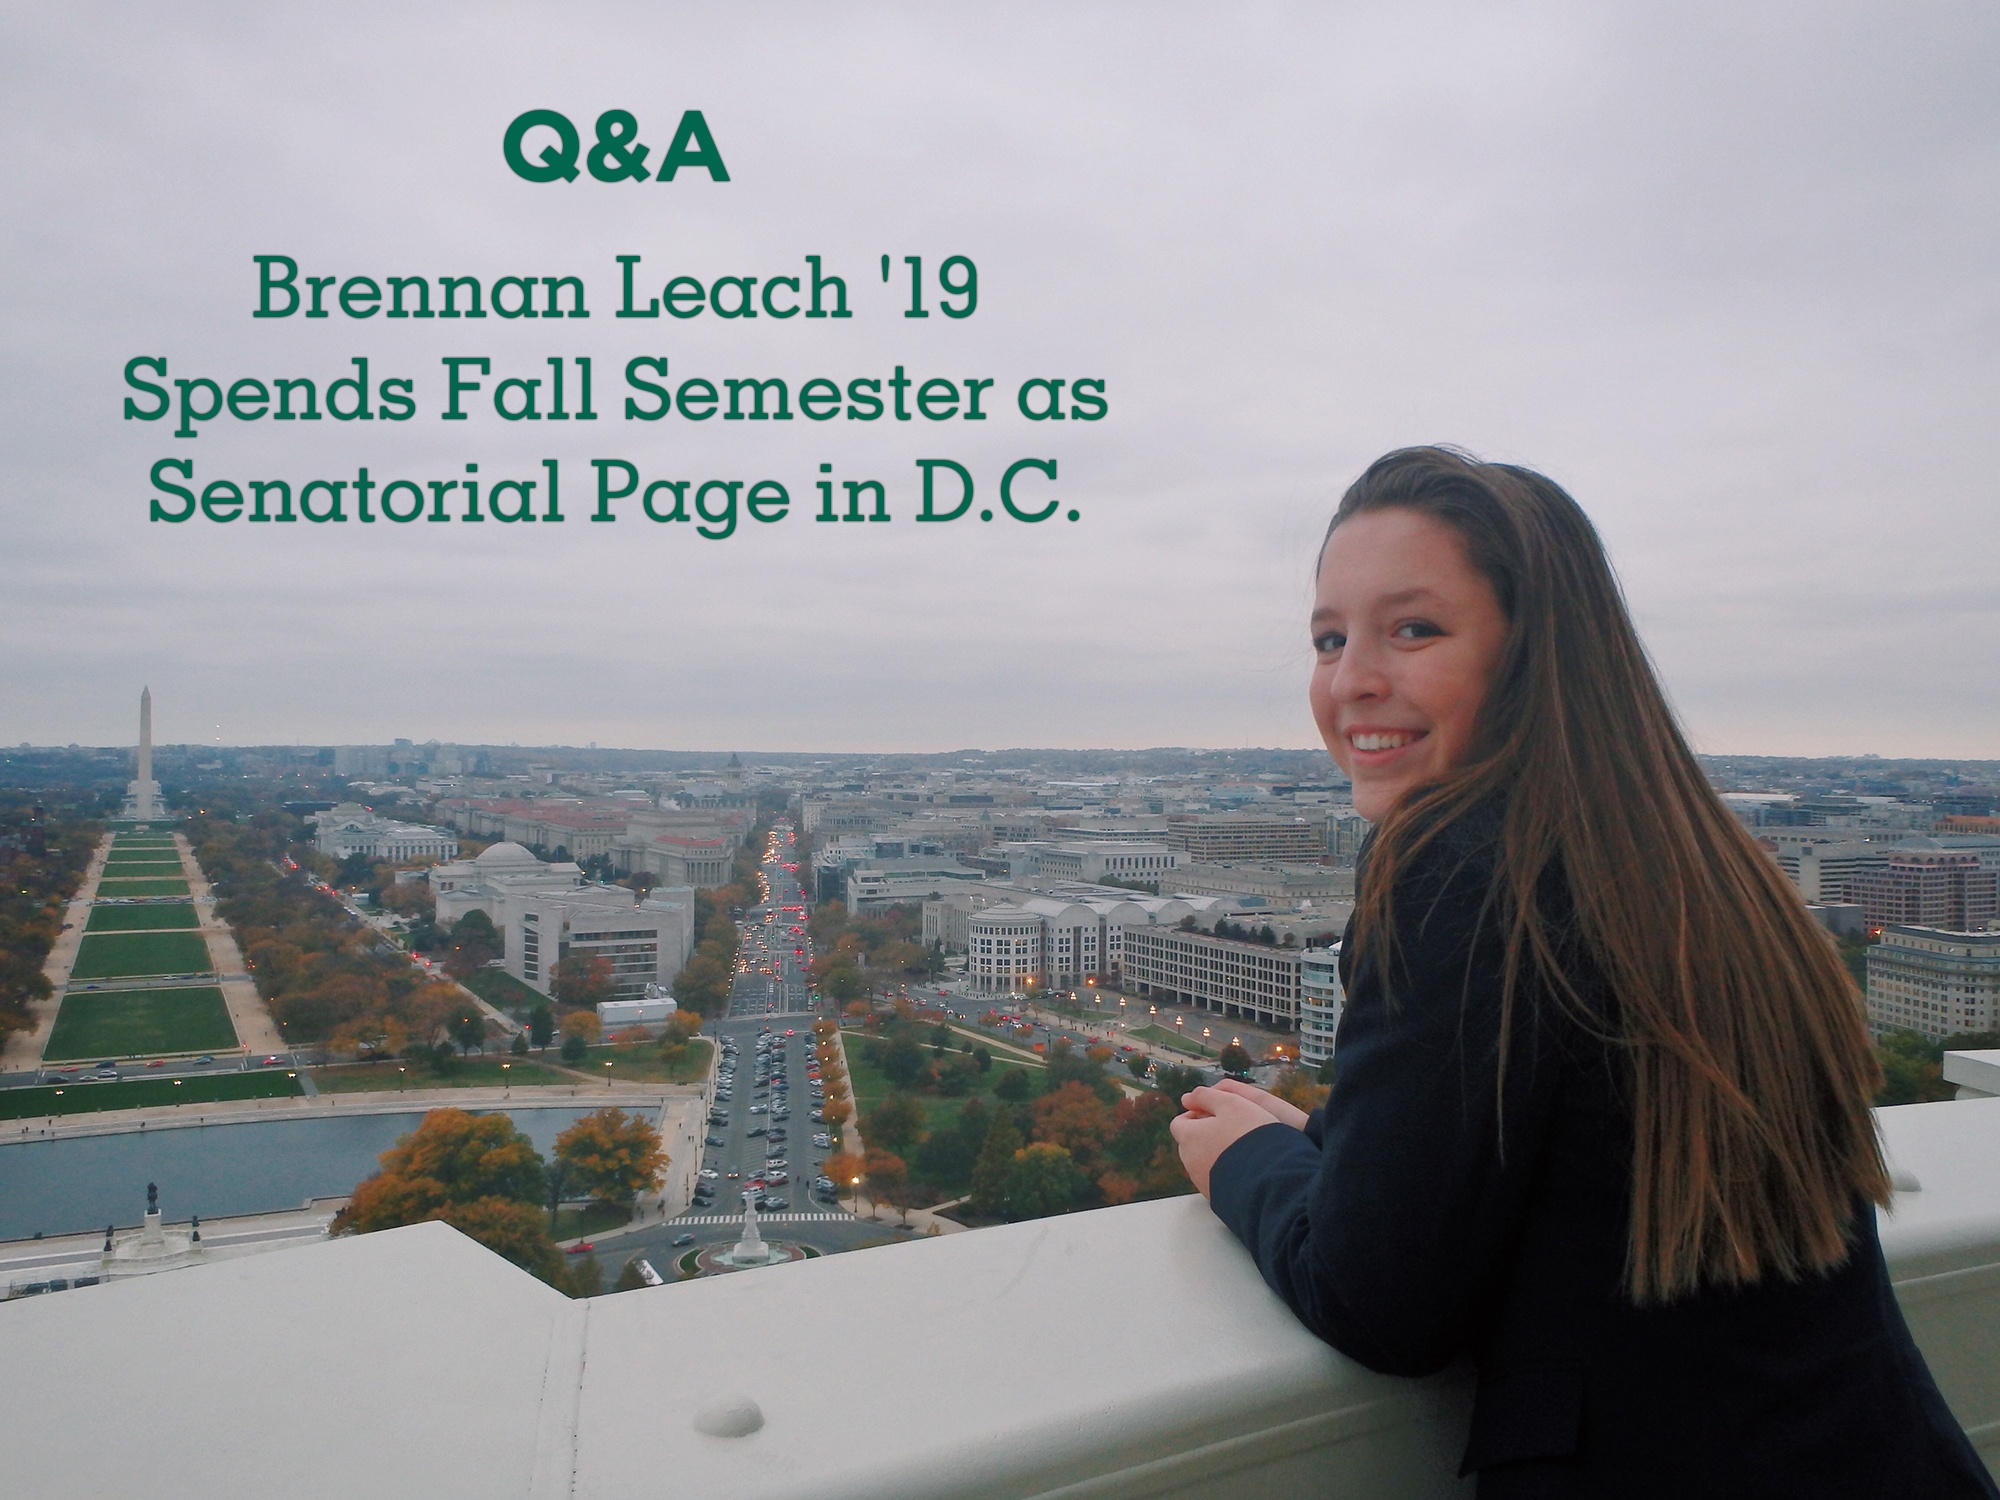 Brennan Leach '19 Spends Fall Semester as Senatorial Page in D.C.